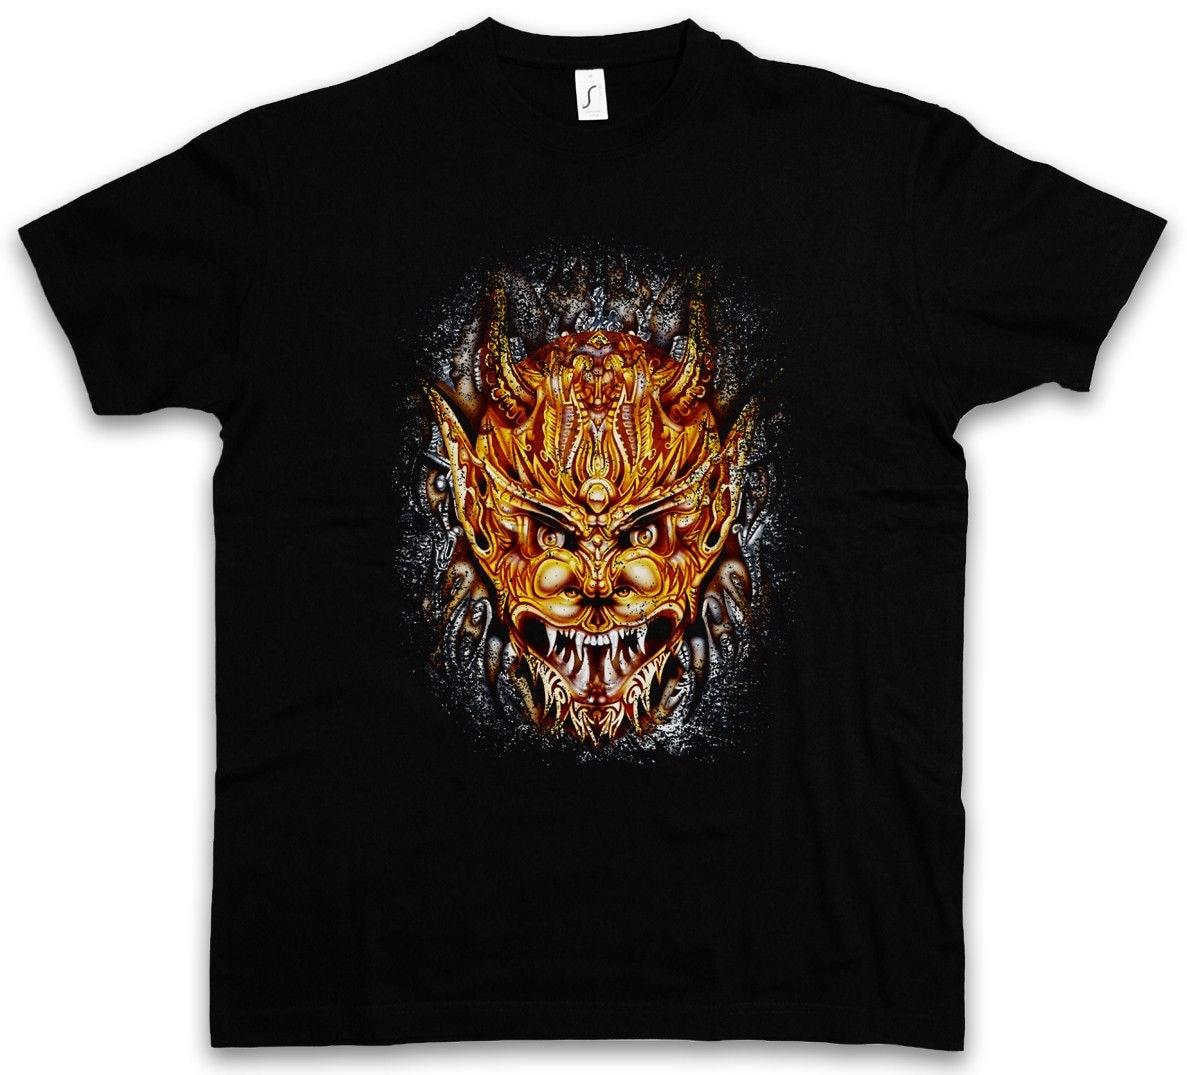 Devil Of De Andy T Shirt Skull Devil Satan Daemon Satanism 666 Tattoo Artcool Casual Pride T Shirt Men Unisexfree Shipping T Shirts Aliexpress